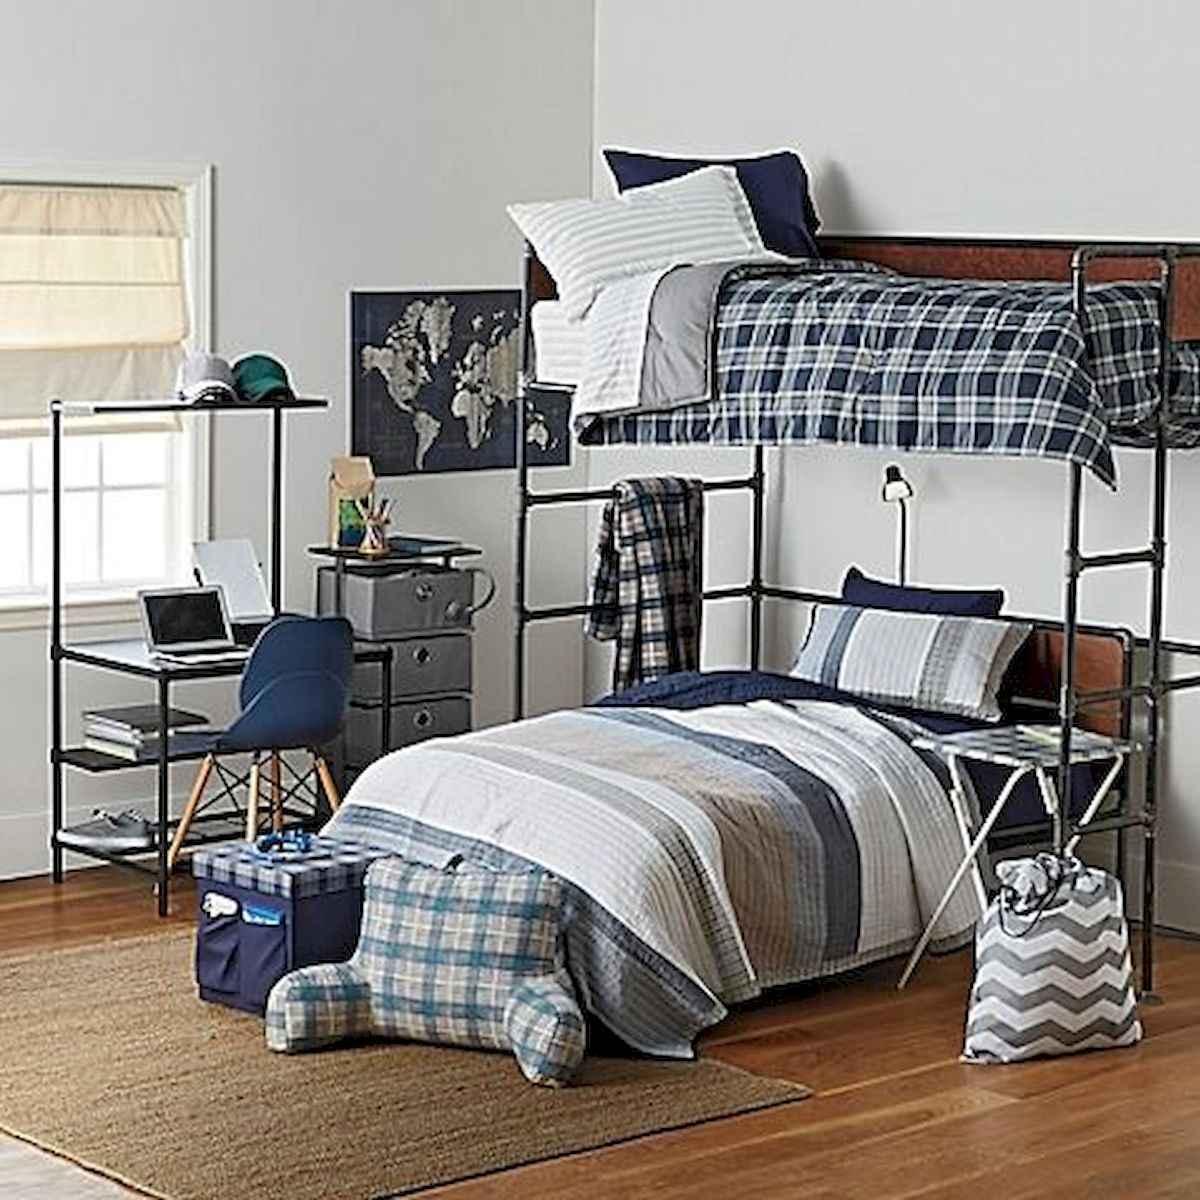 80 Fantastic Small Apartment Bedroom College Design Ideas and Decor (54)